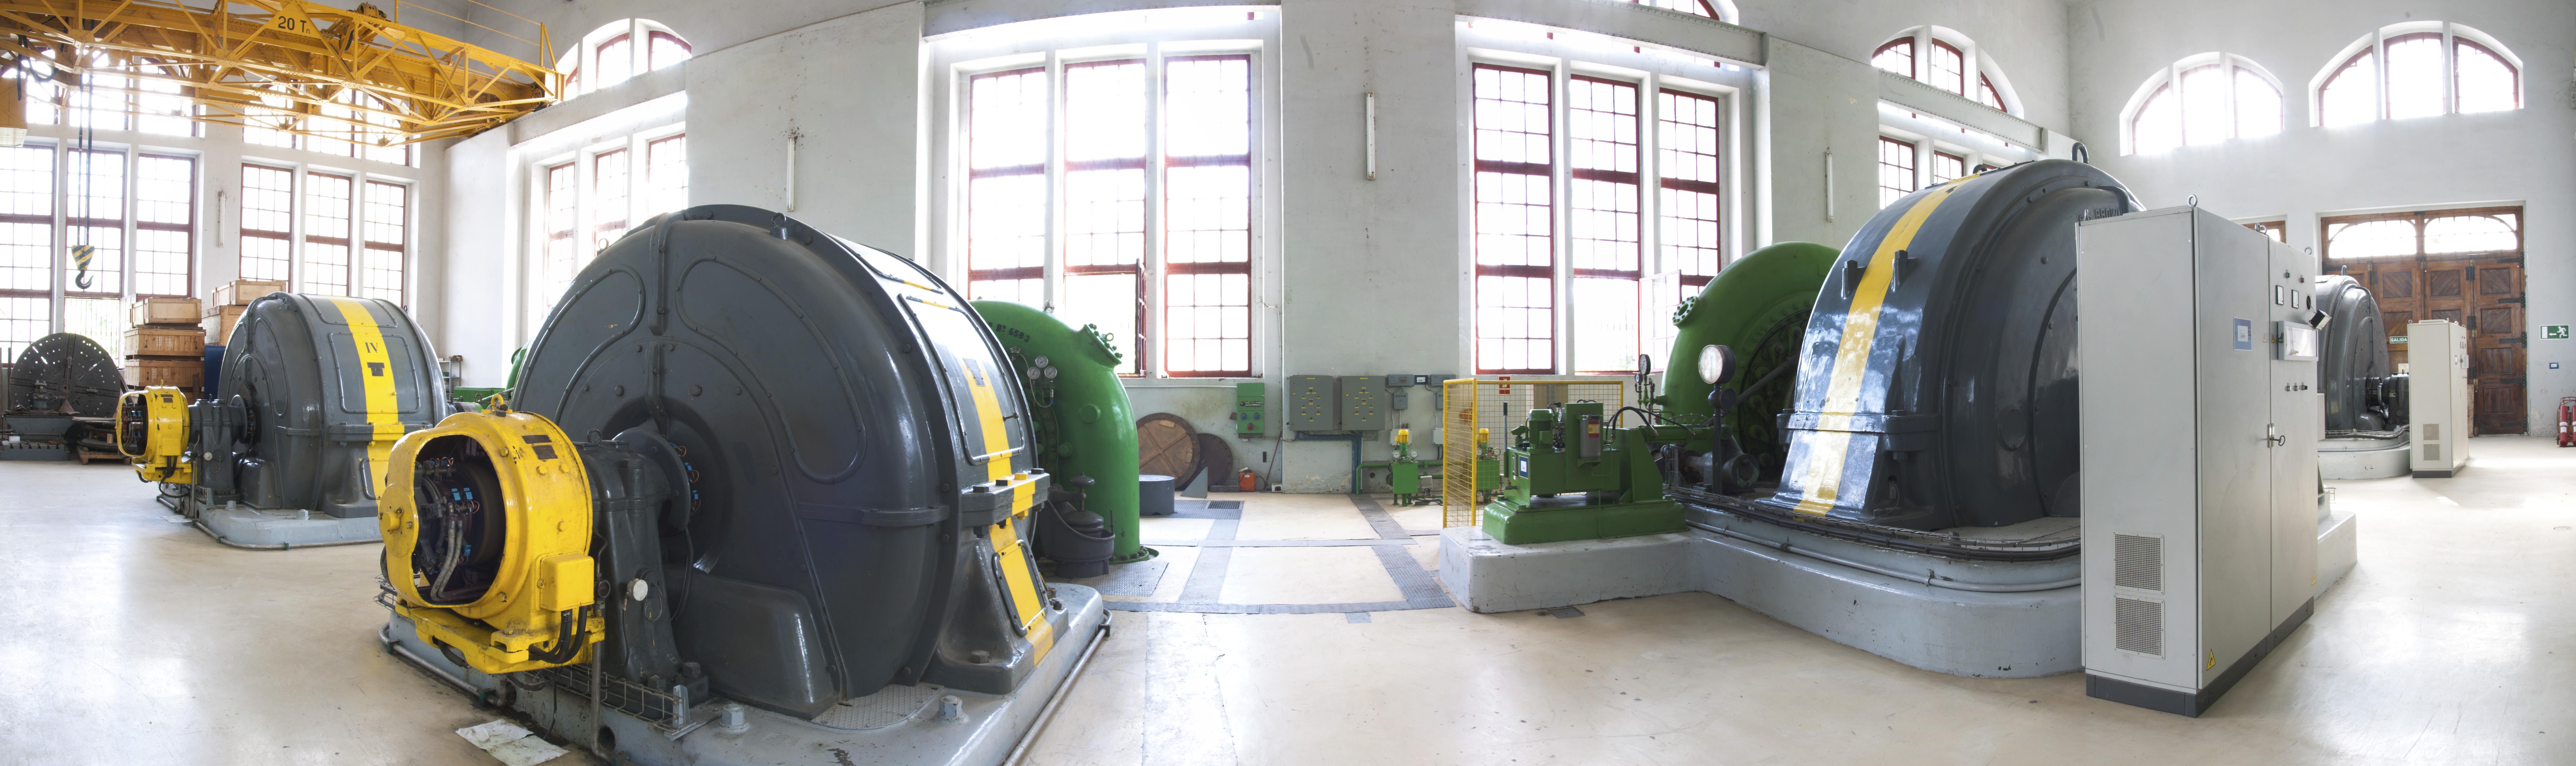 industrial 15